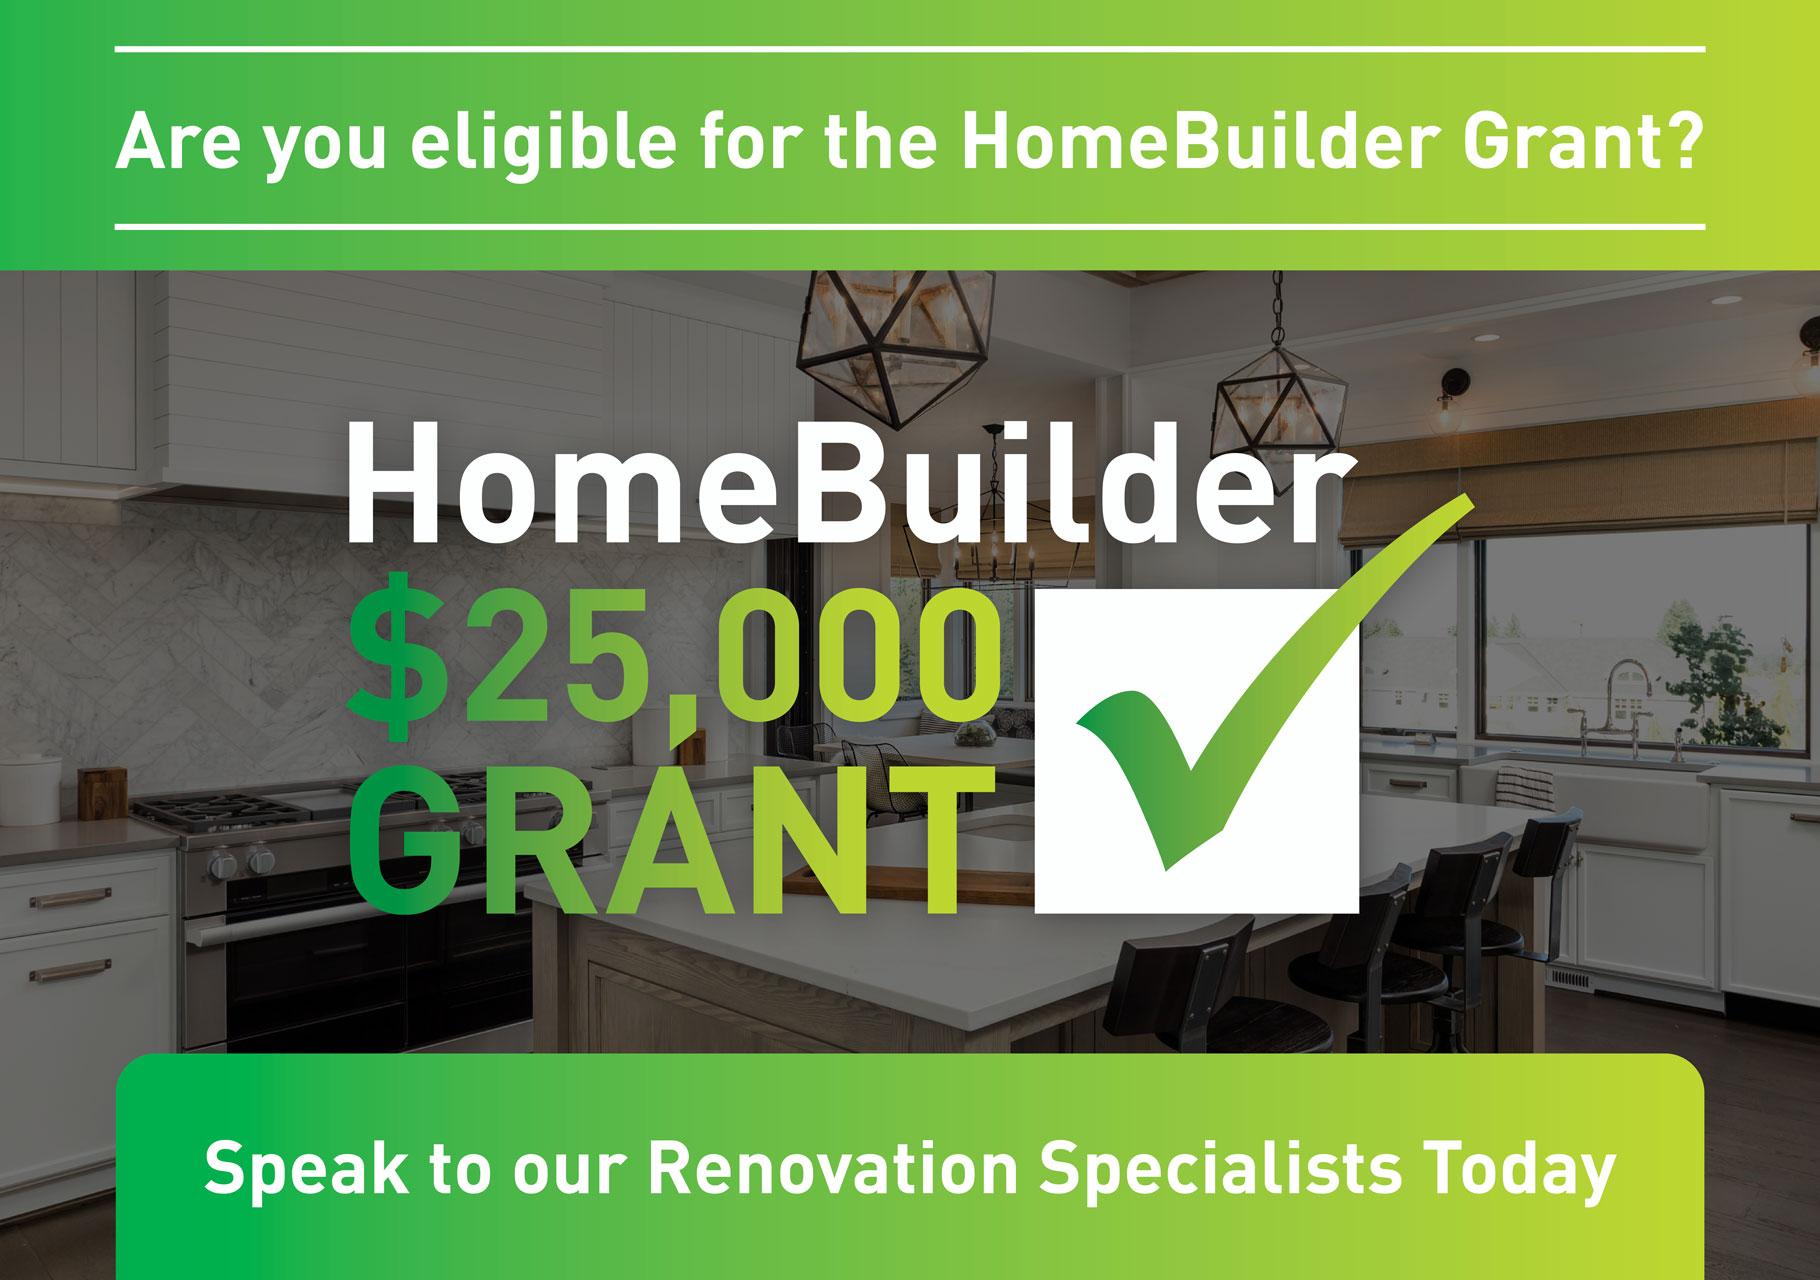 01-homebuilder-grant-1820x1280-mobile